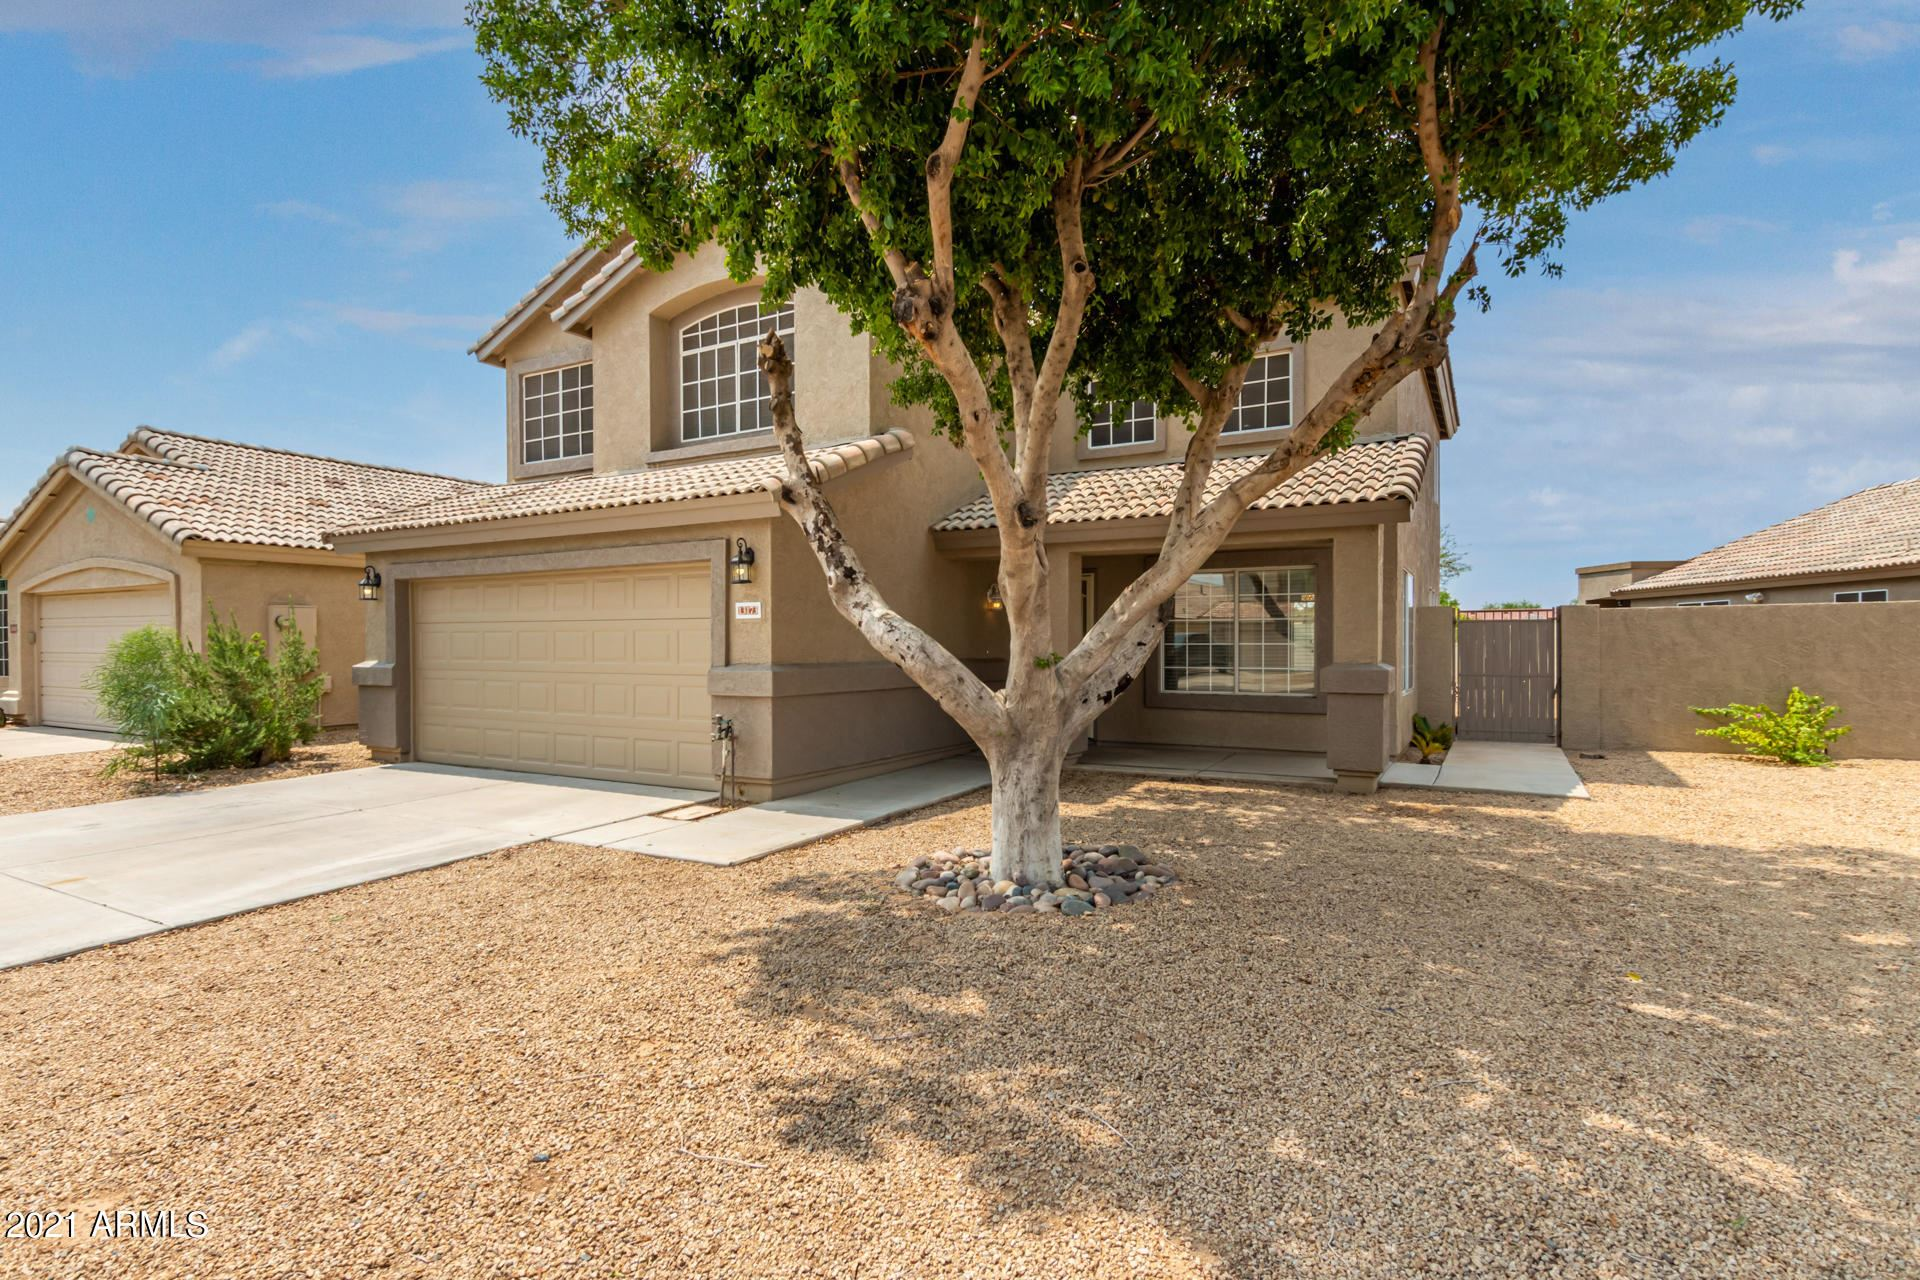 Photo of 13173 W MONTE VISTA Drive, Goodyear, AZ 85395 (MLS # 6269254)